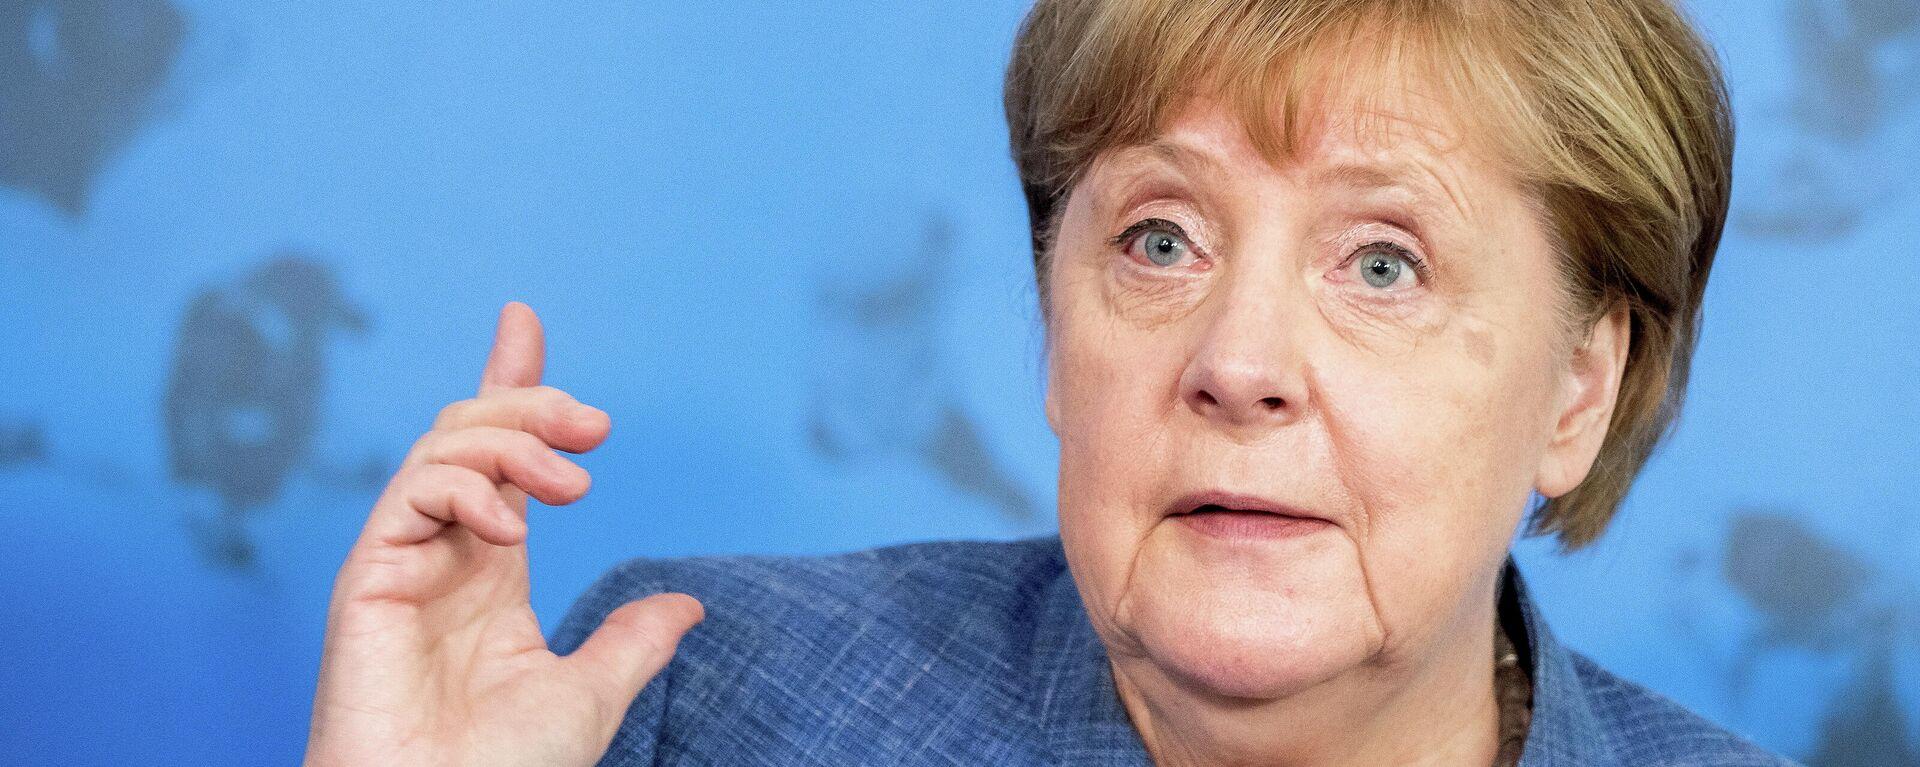 Angela Merkel, canciller alemana - Sputnik Mundo, 1920, 13.07.2021